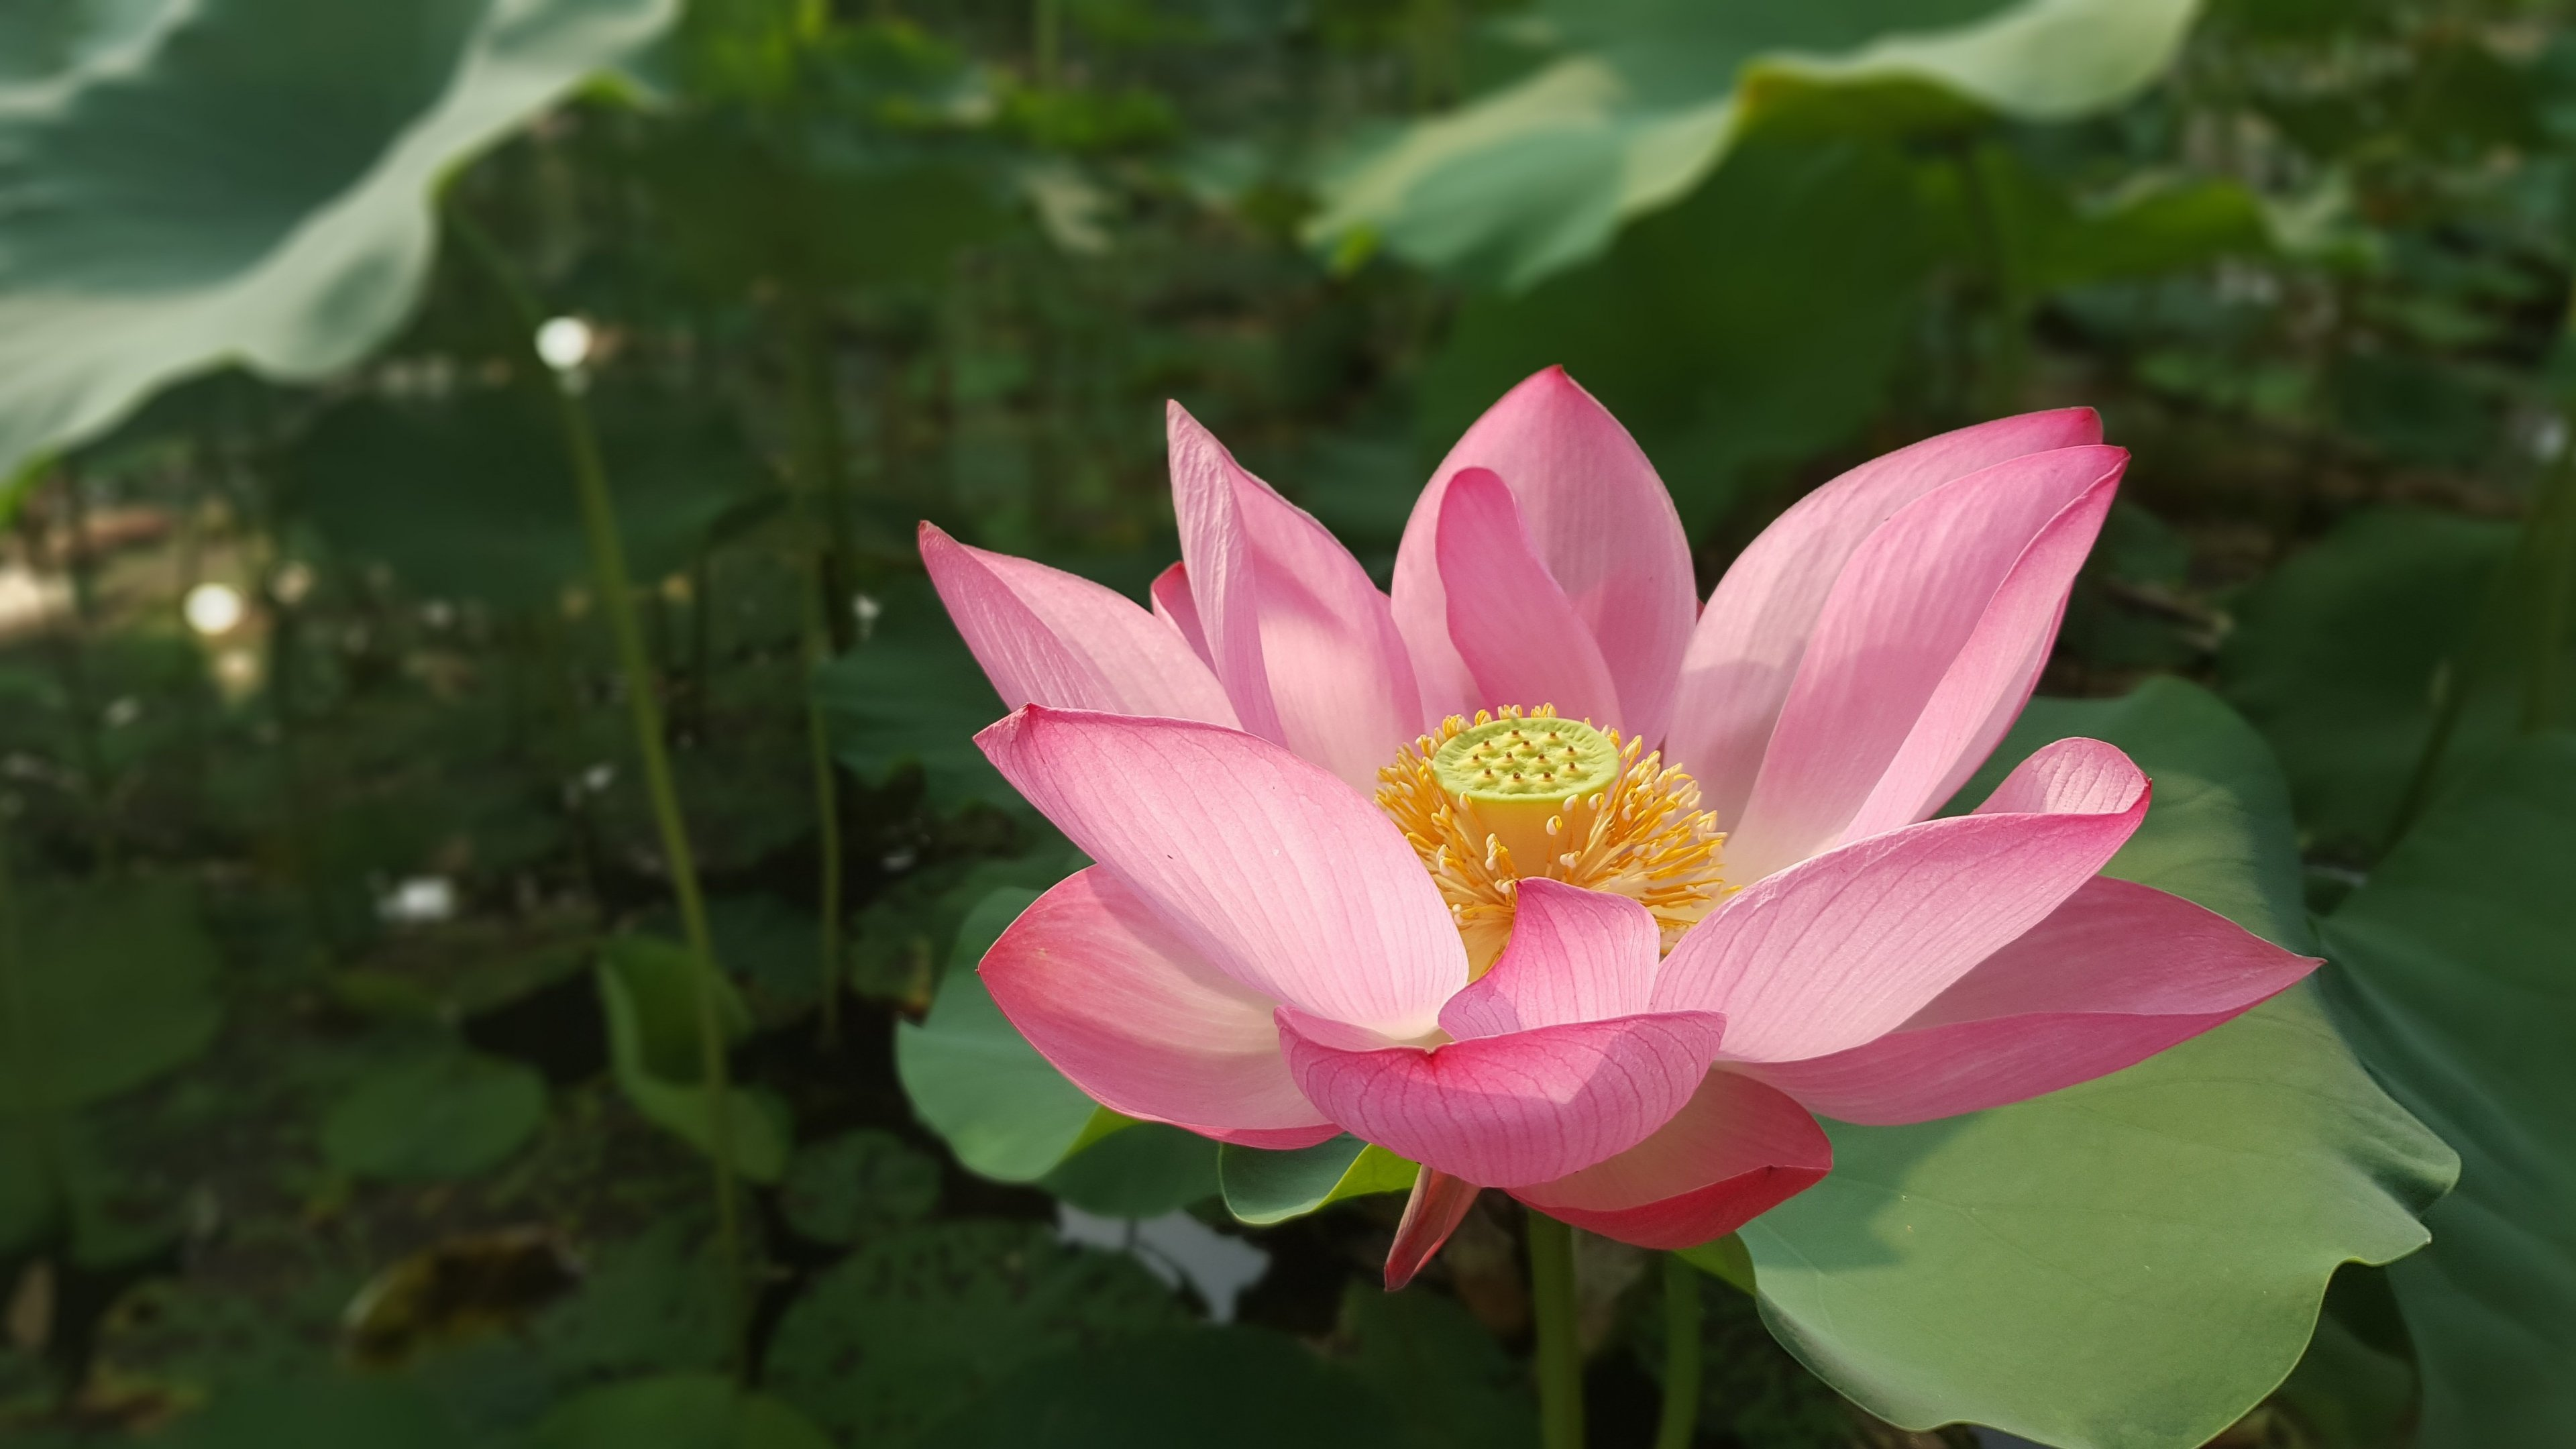 Lotus flower wallpaper mobile desktop background lotus flower izmirmasajfo